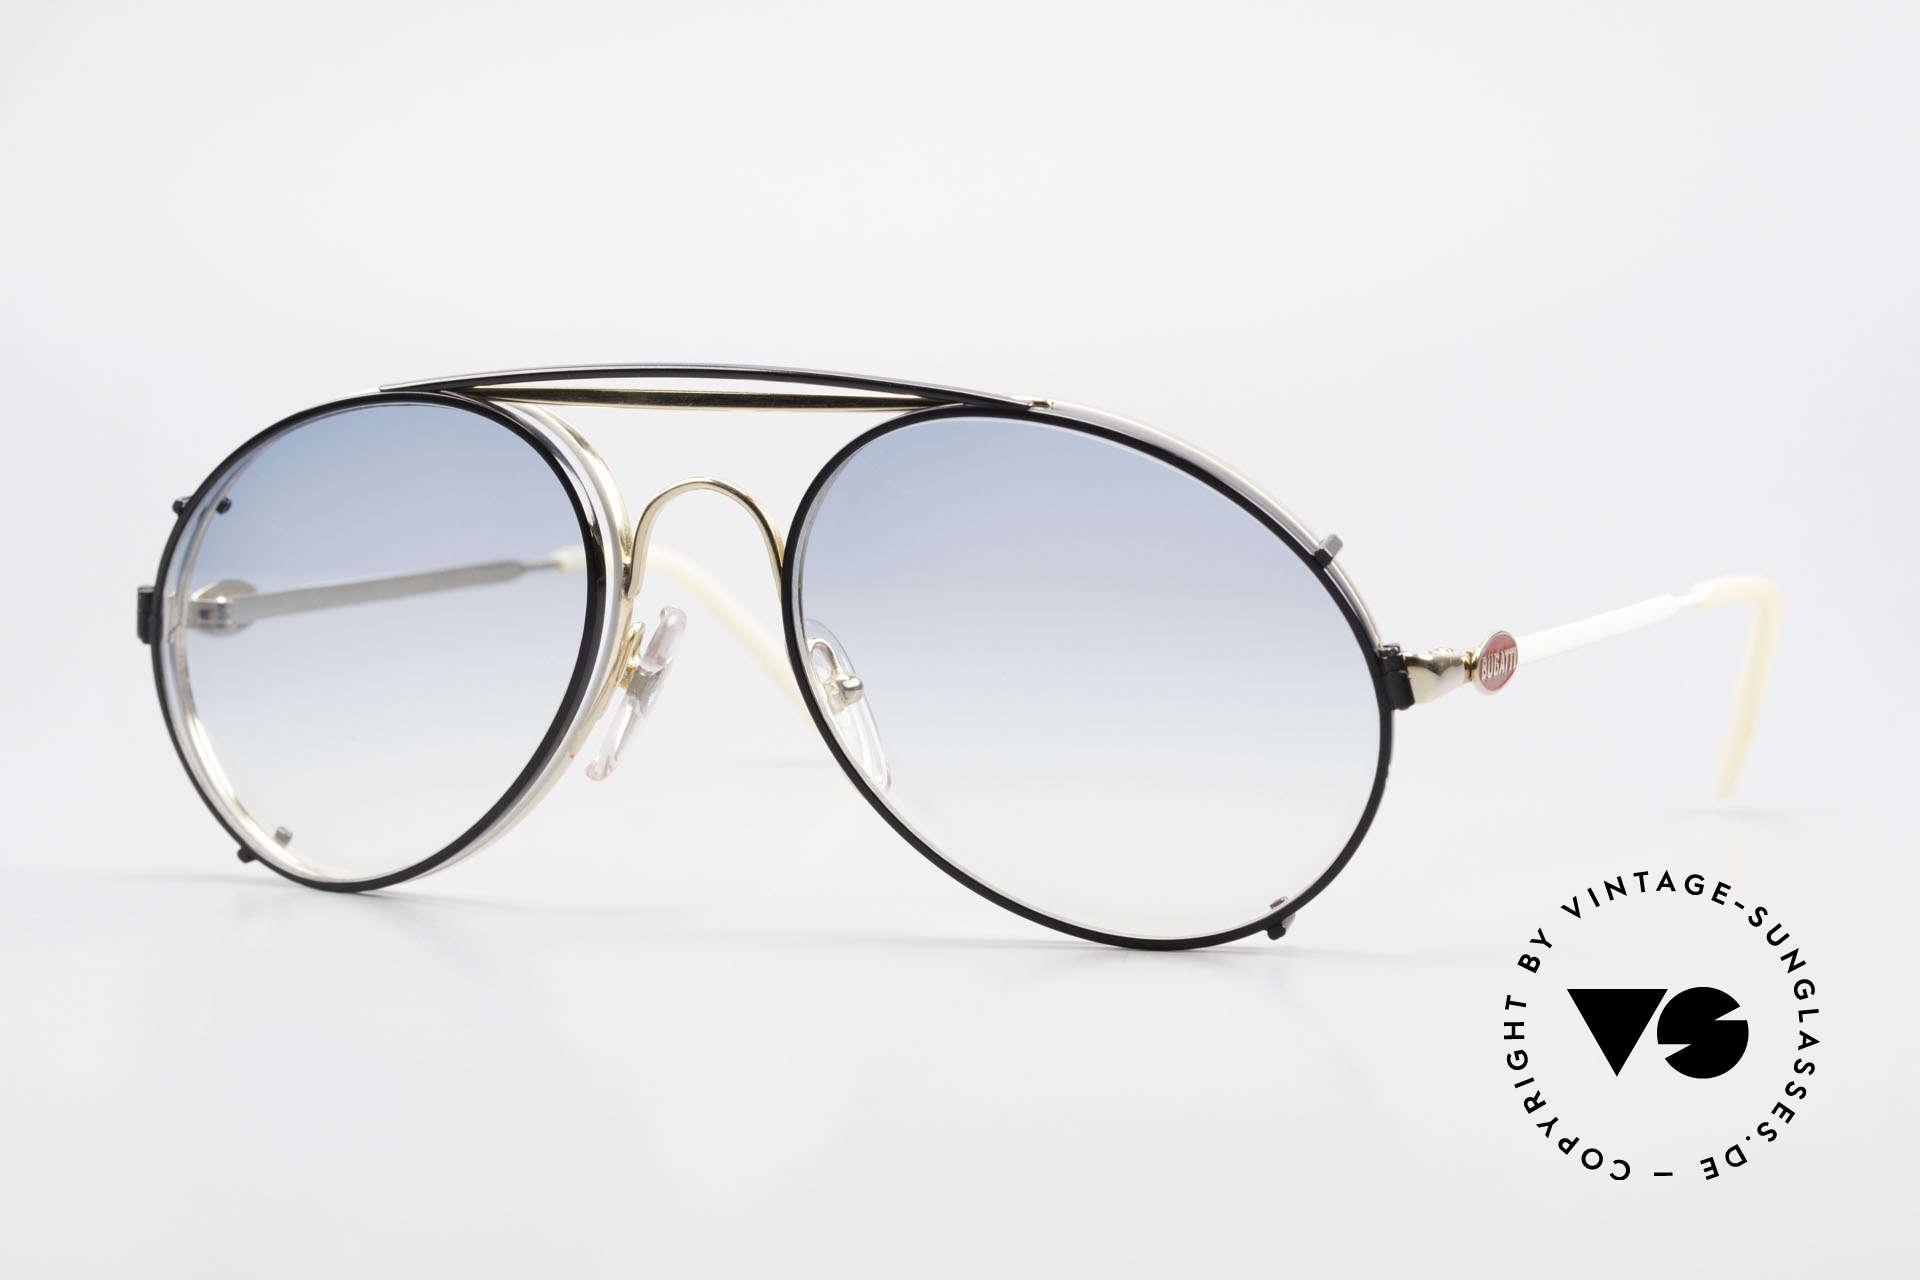 Bugatti 65987 Vintage Frame With Clip On, rare VINTAGE Bugatti 80's luxury sunglasses, Made for Men